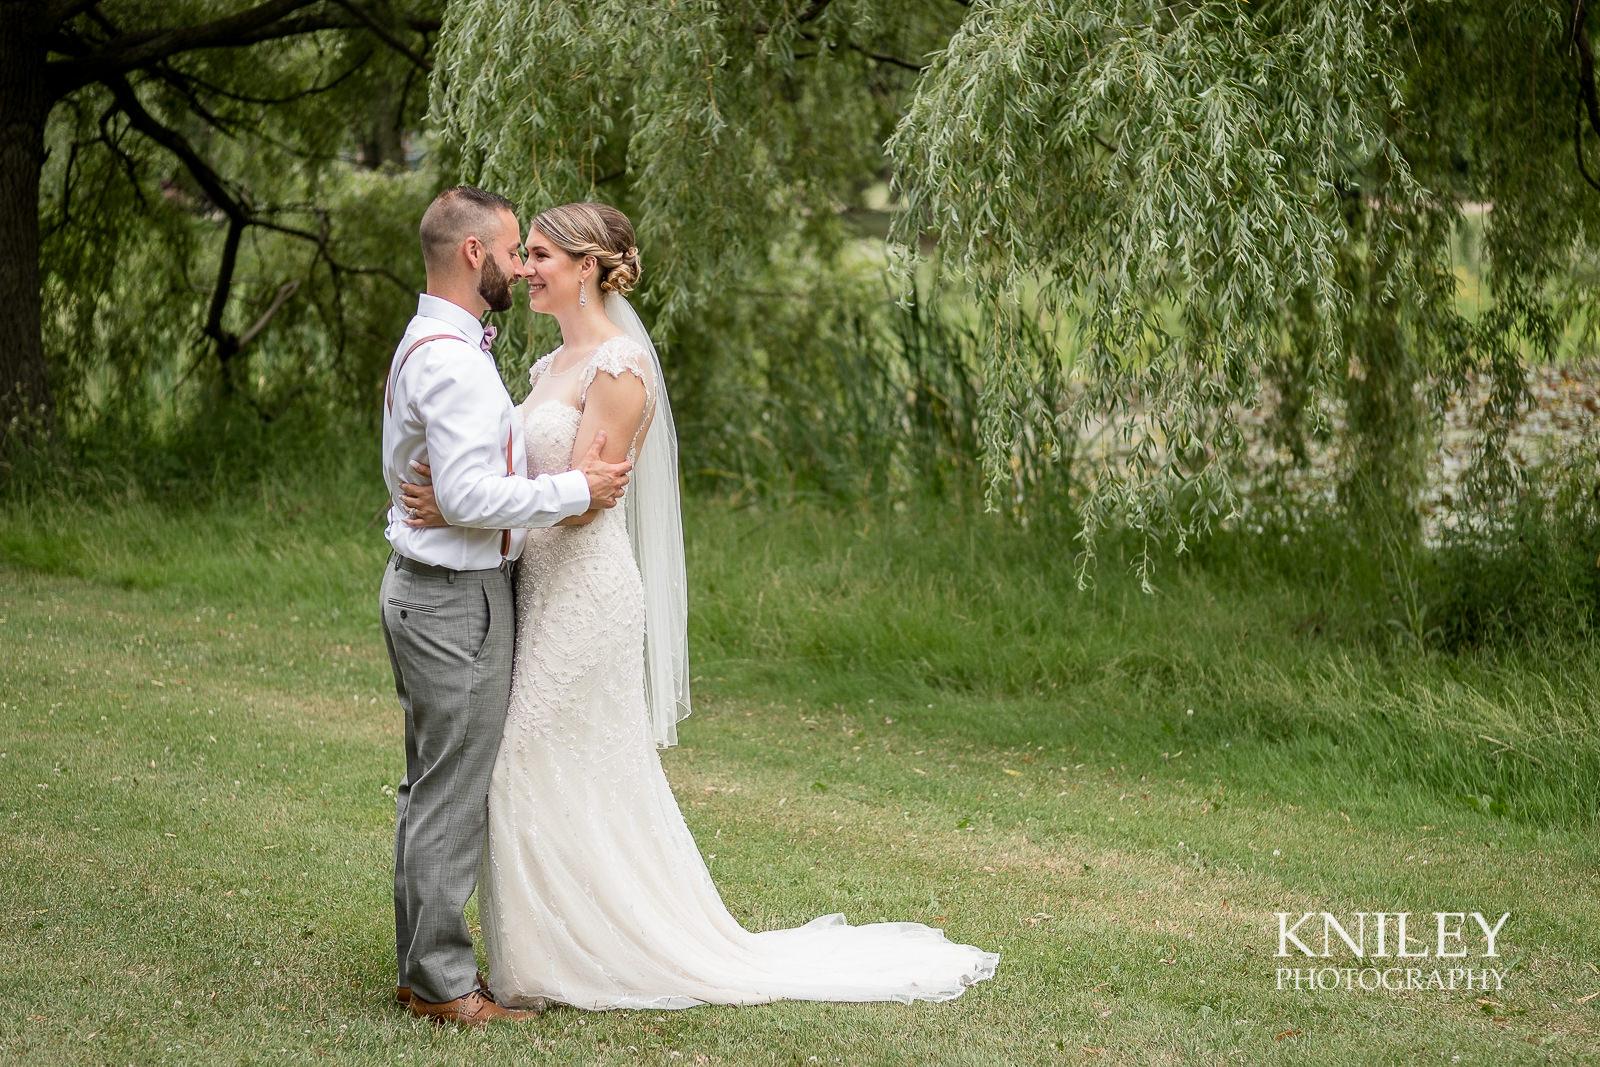 071 - Ontario Golf Club Wedding Pictures - XT2A6907.jpg